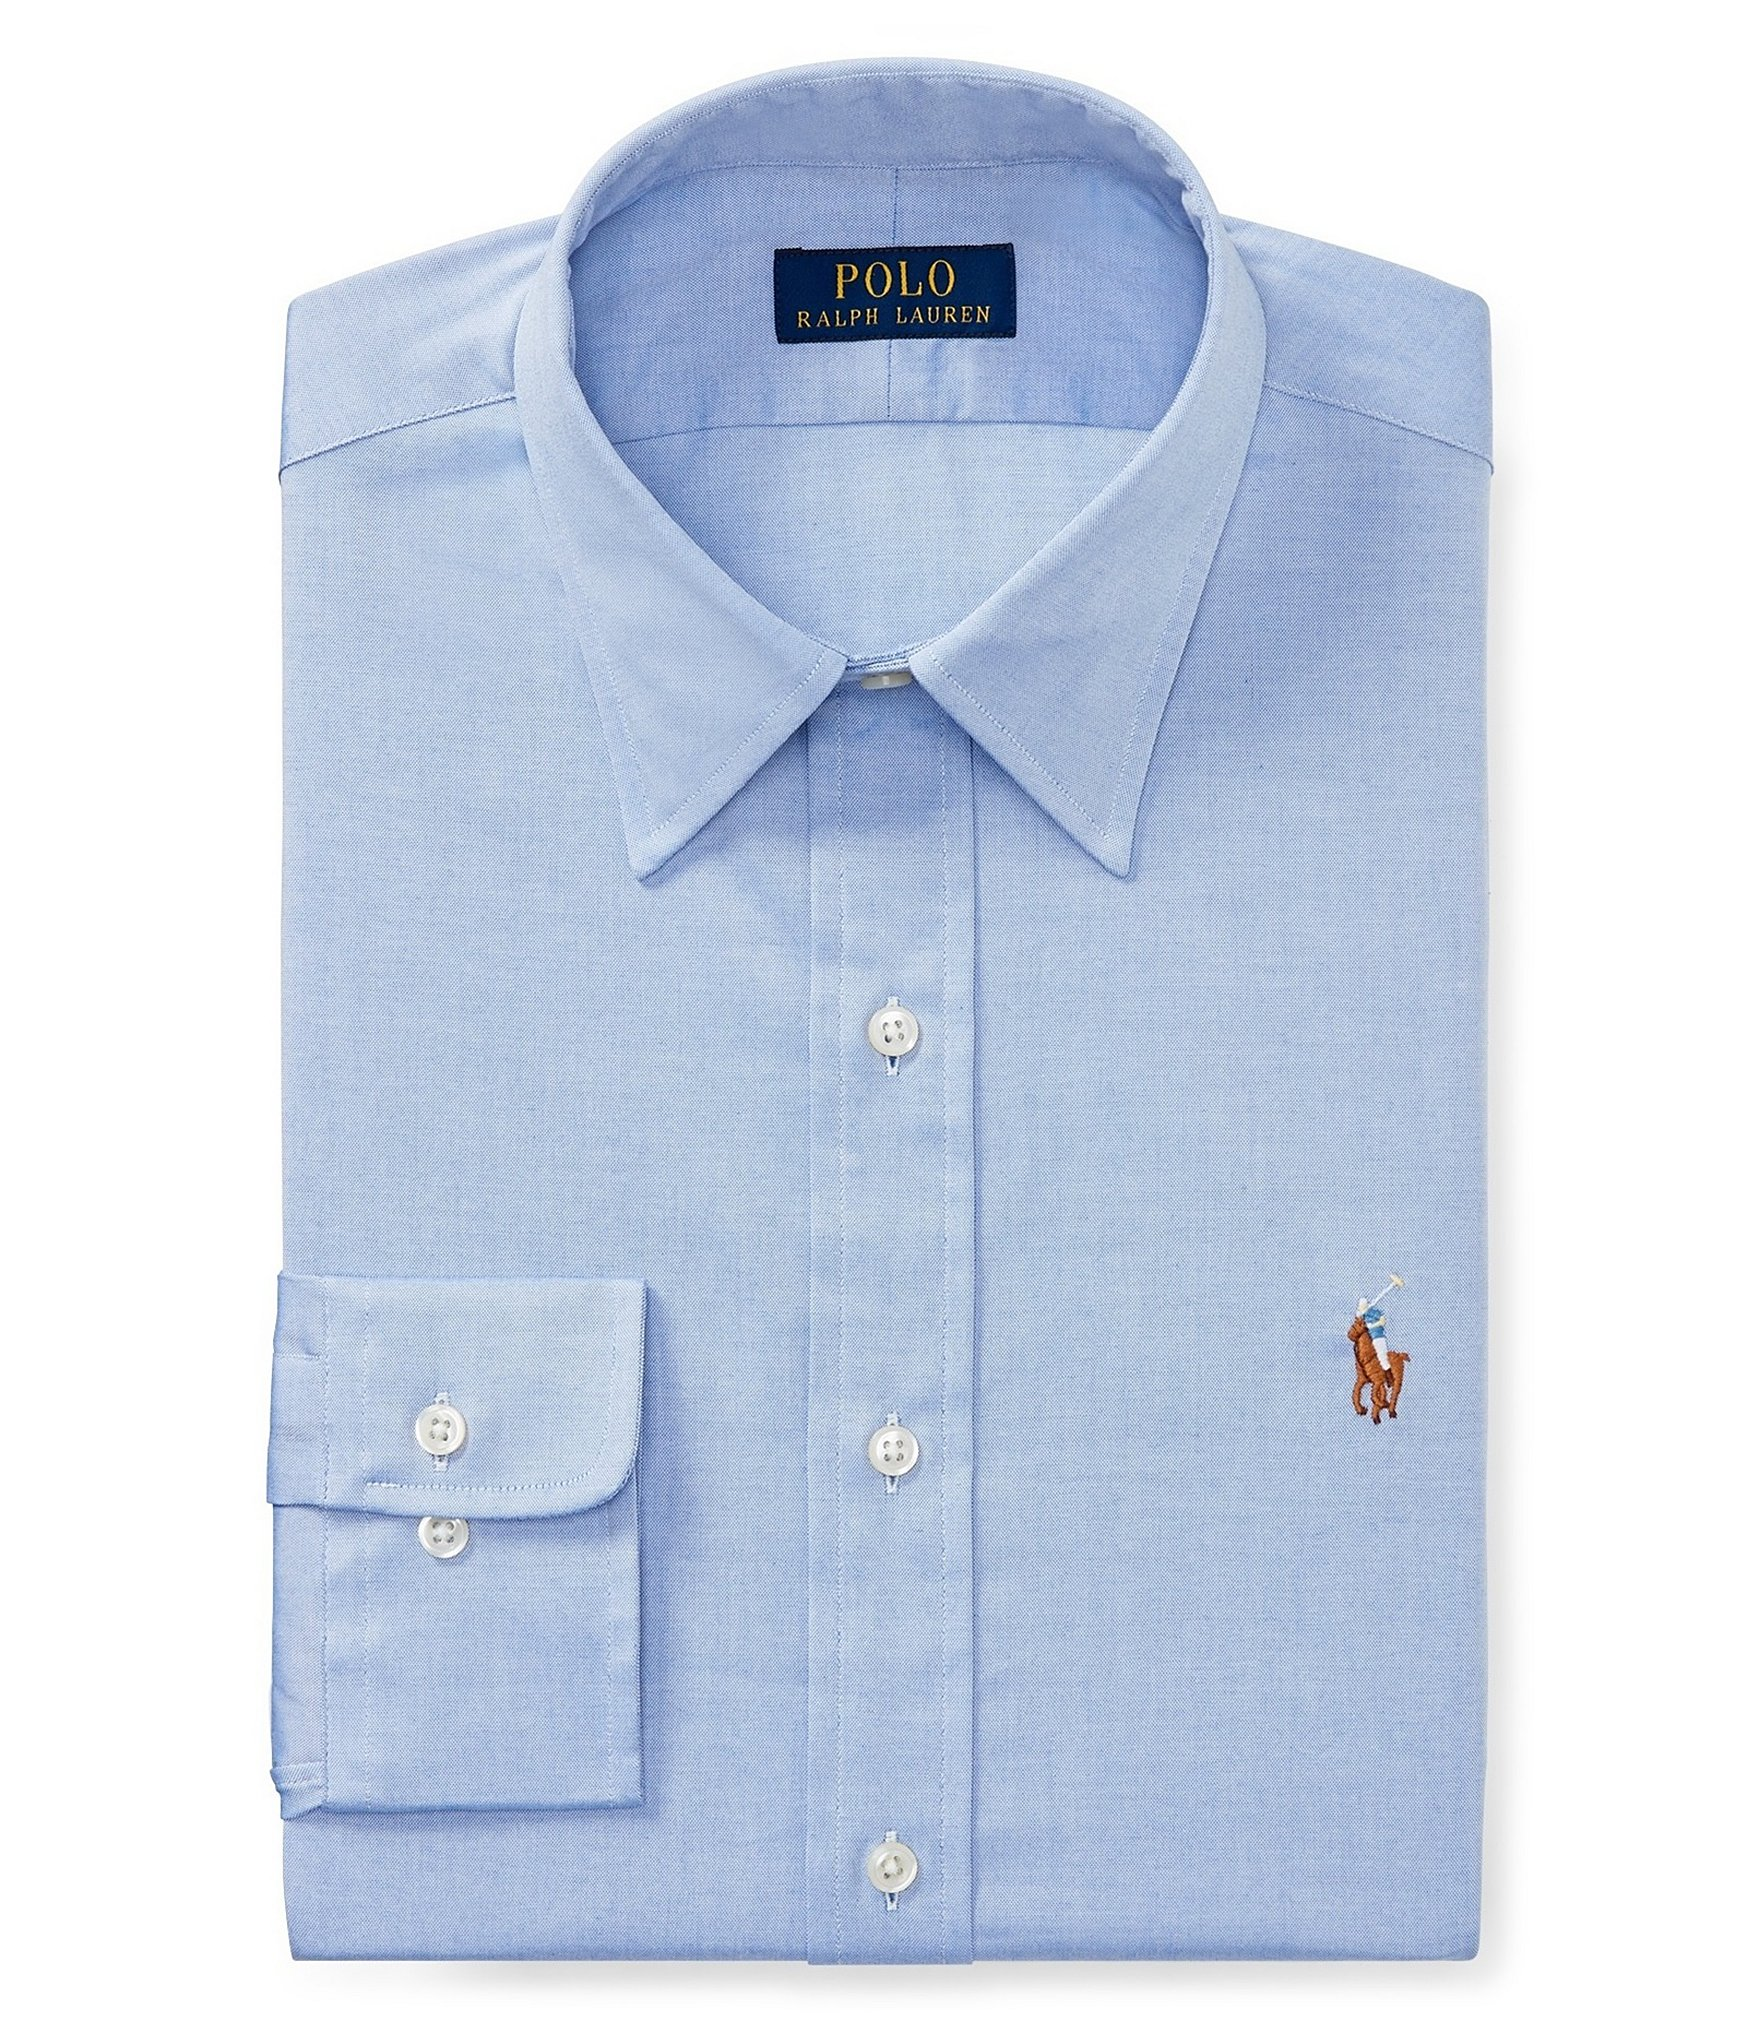 Boys Polo Shirts Ralph Lauren On Sale Polo By Ralph Lauren Custom